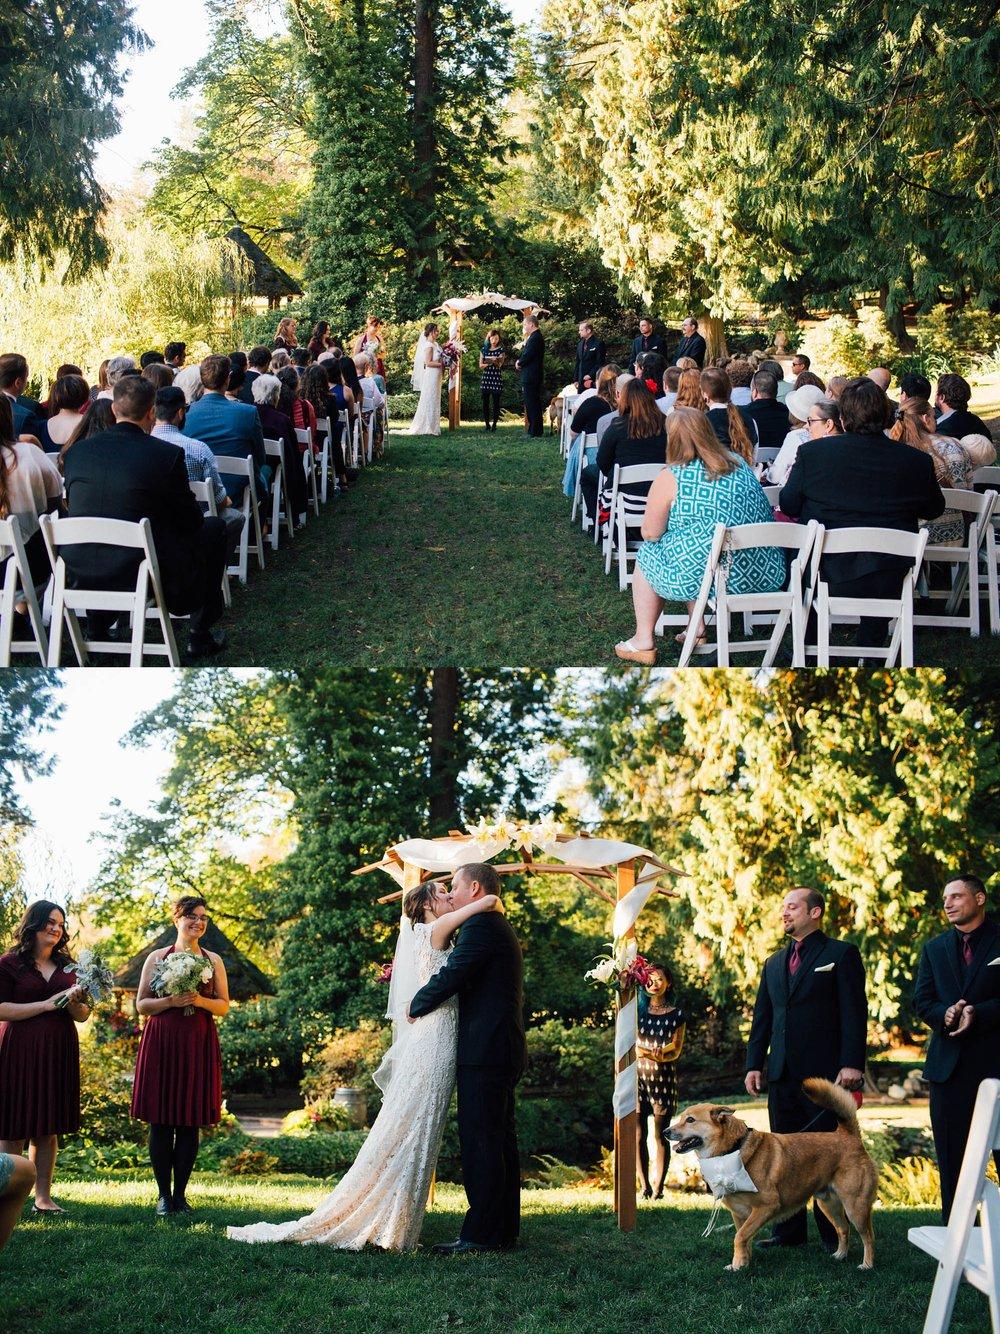 ashley_vos_seattle_ wedding_photographer_0192.jpg